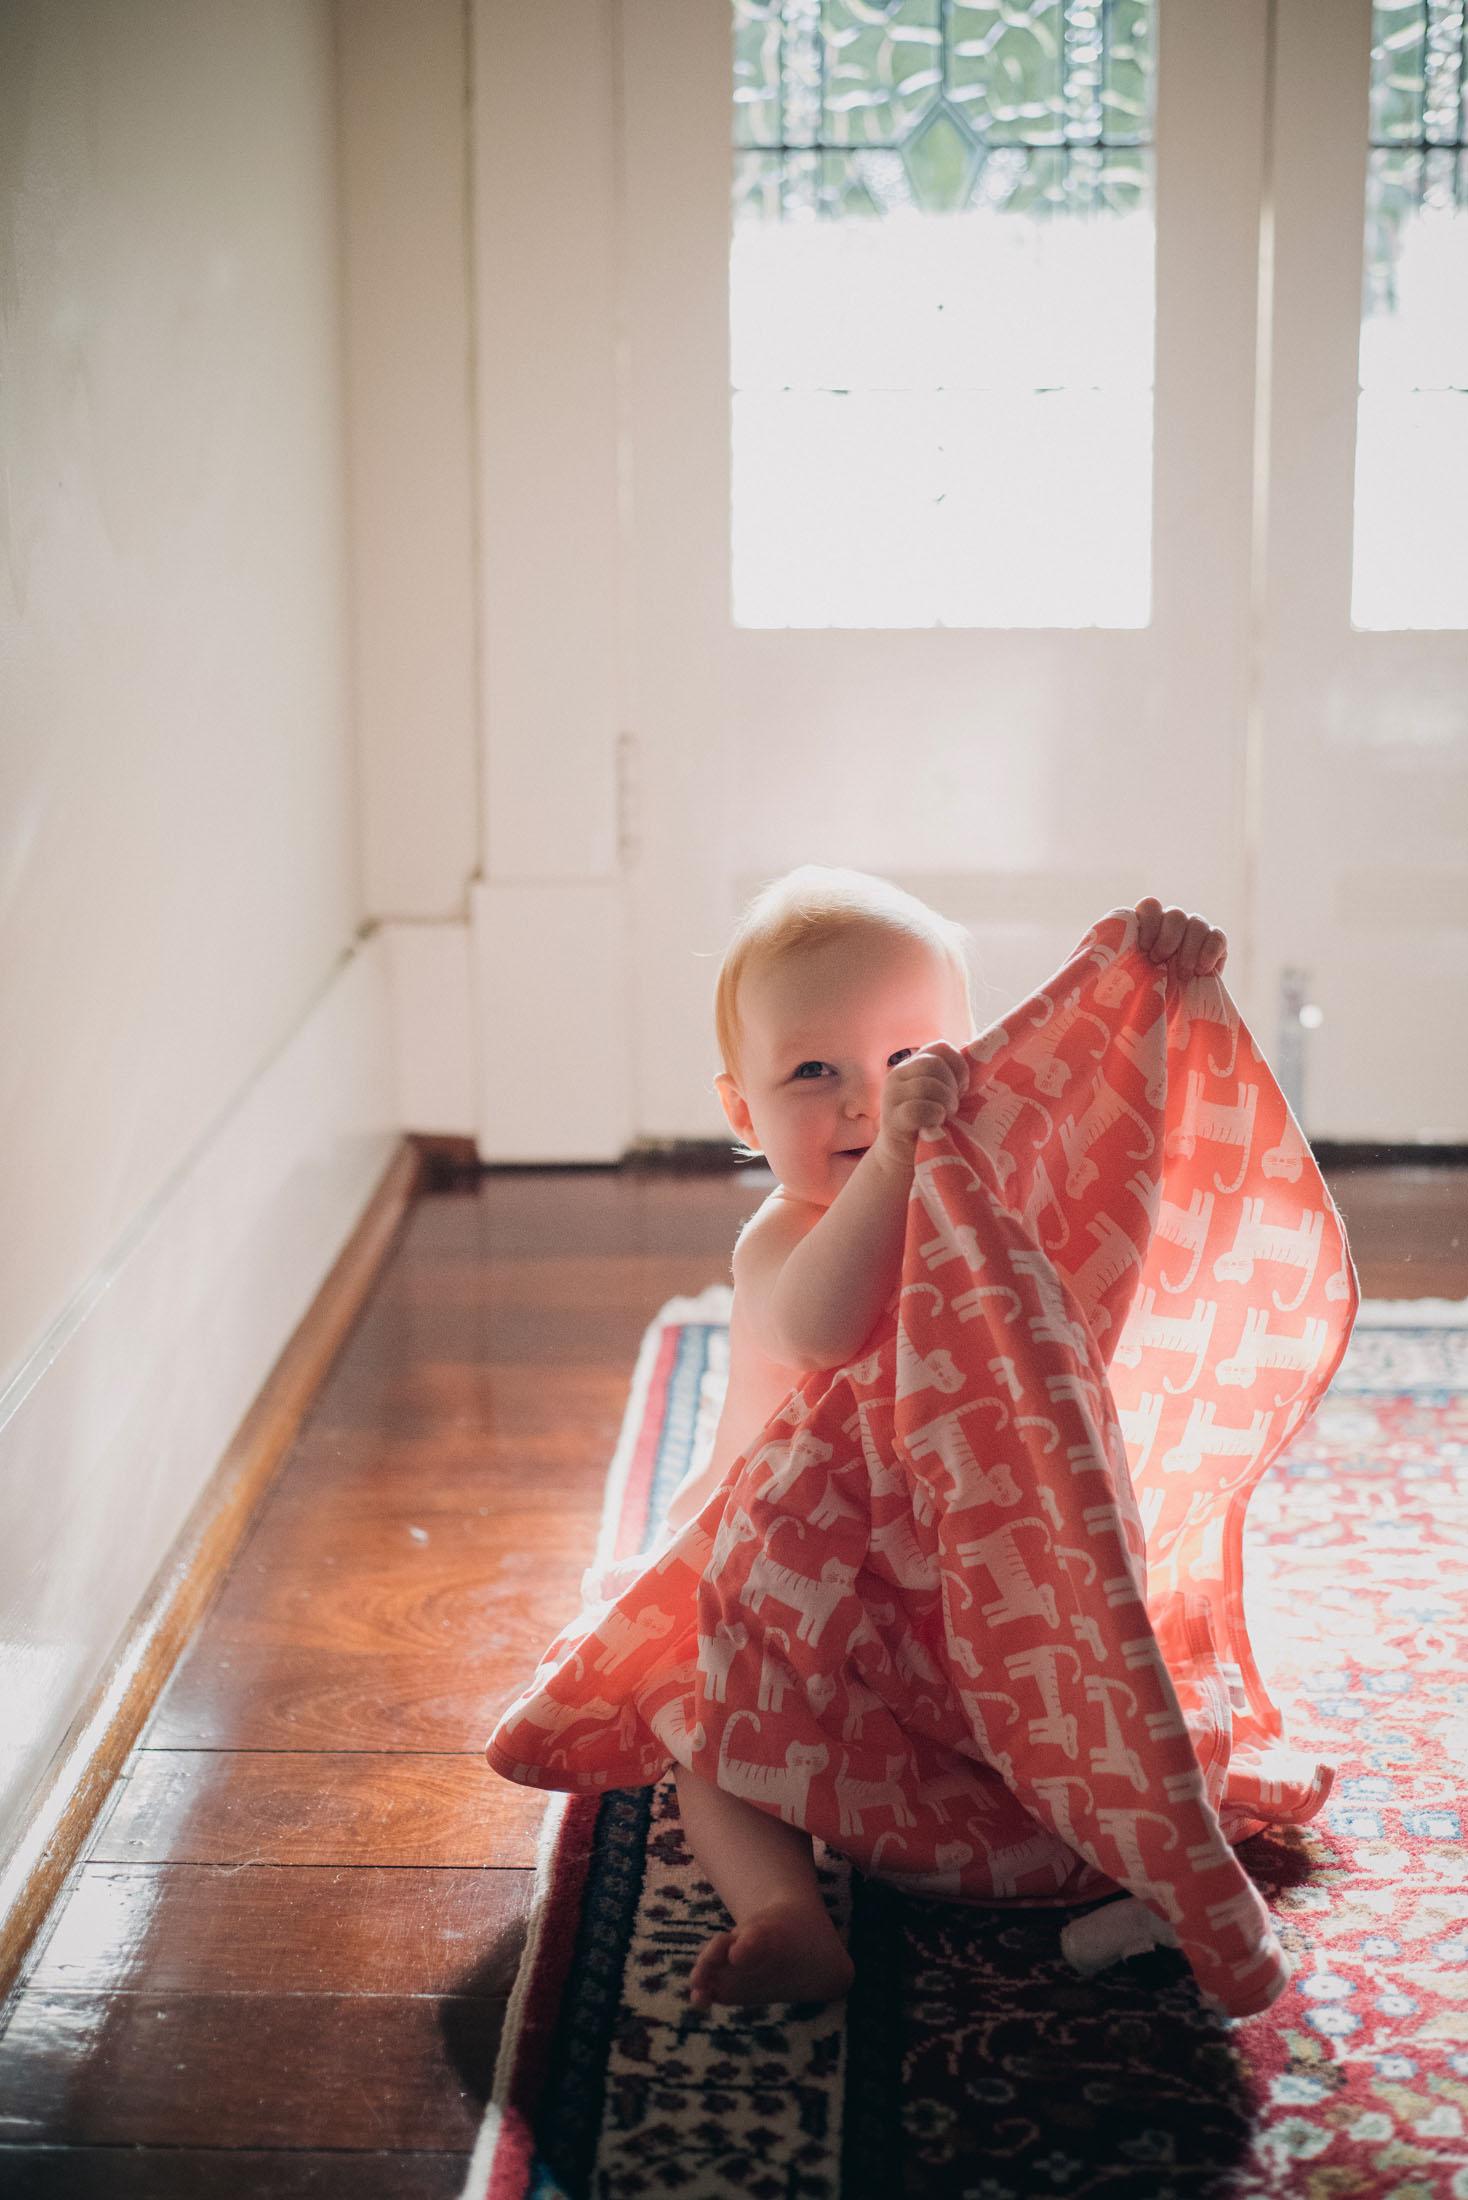 Allen_Family-Photography-unposed09.JPG